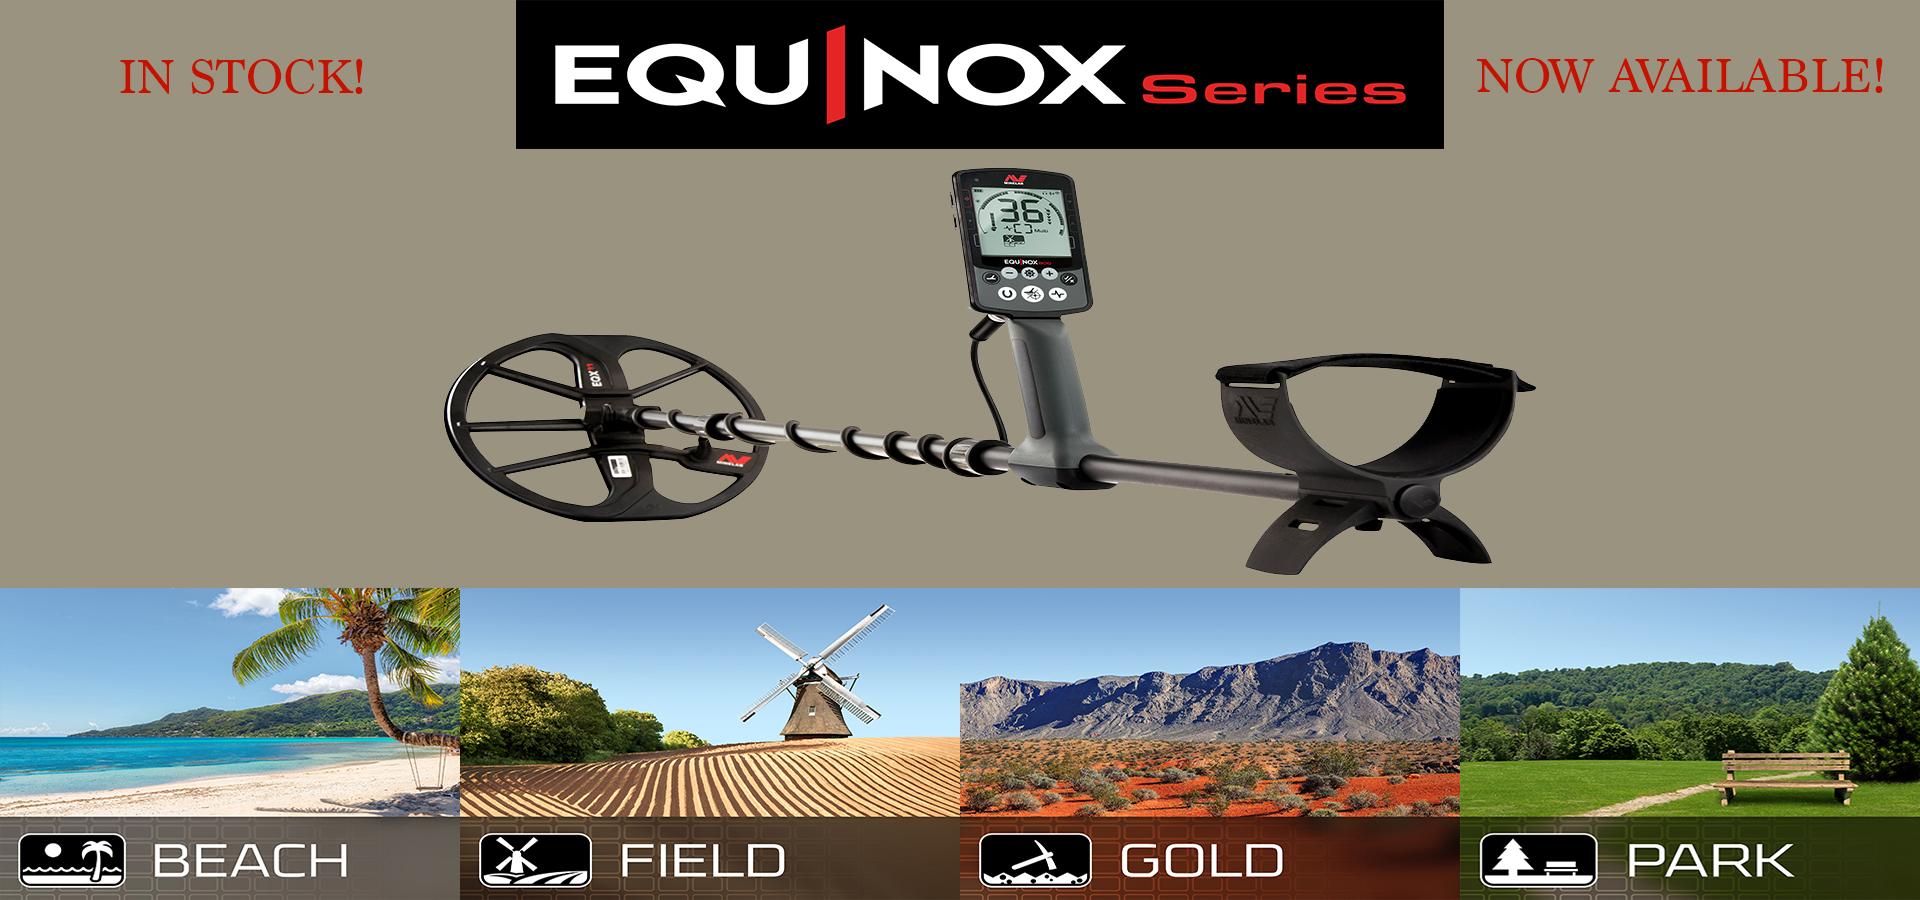 Equinox_Ad